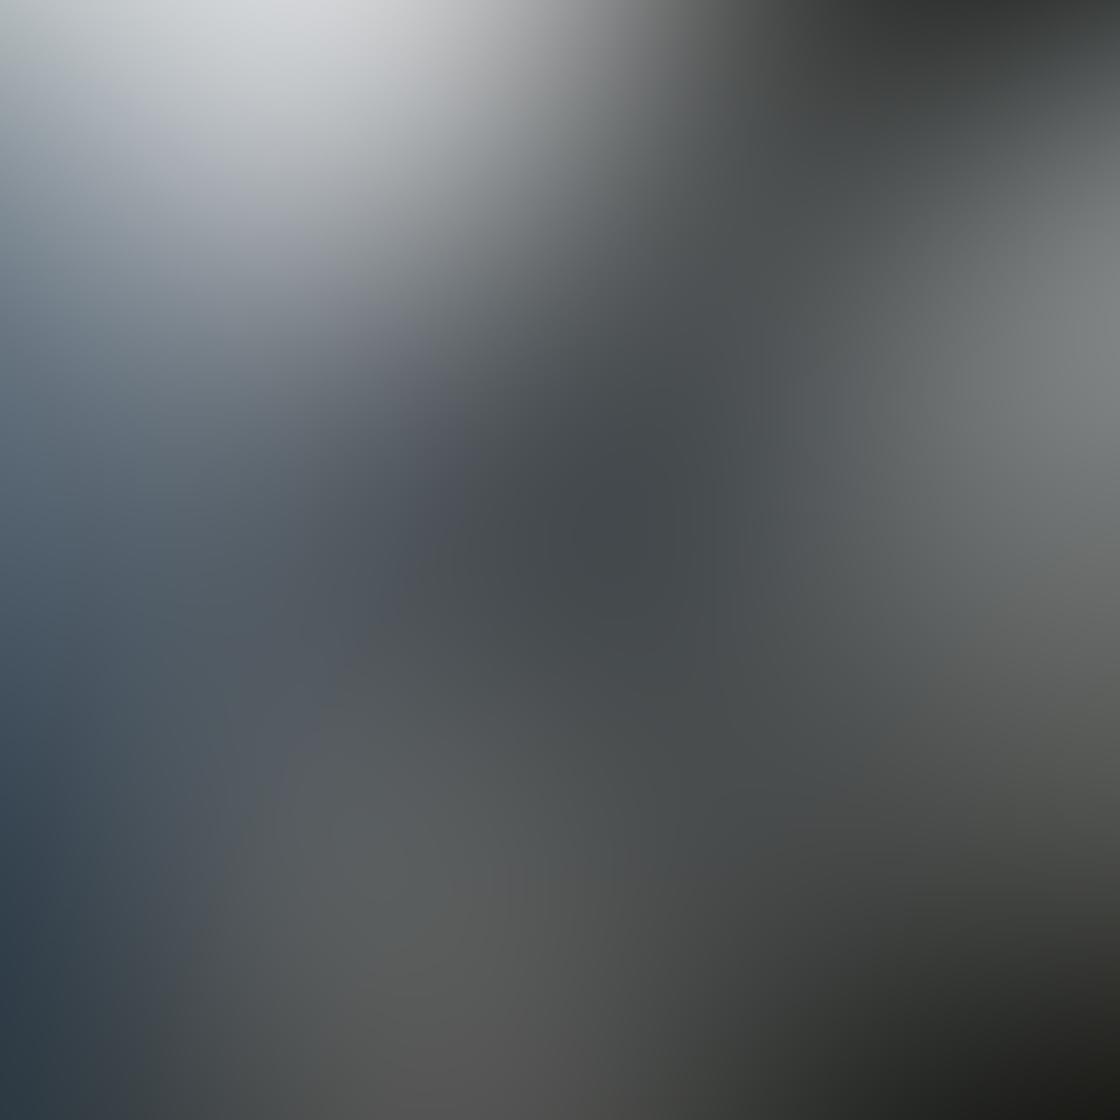 iPhone Angle Photo 29